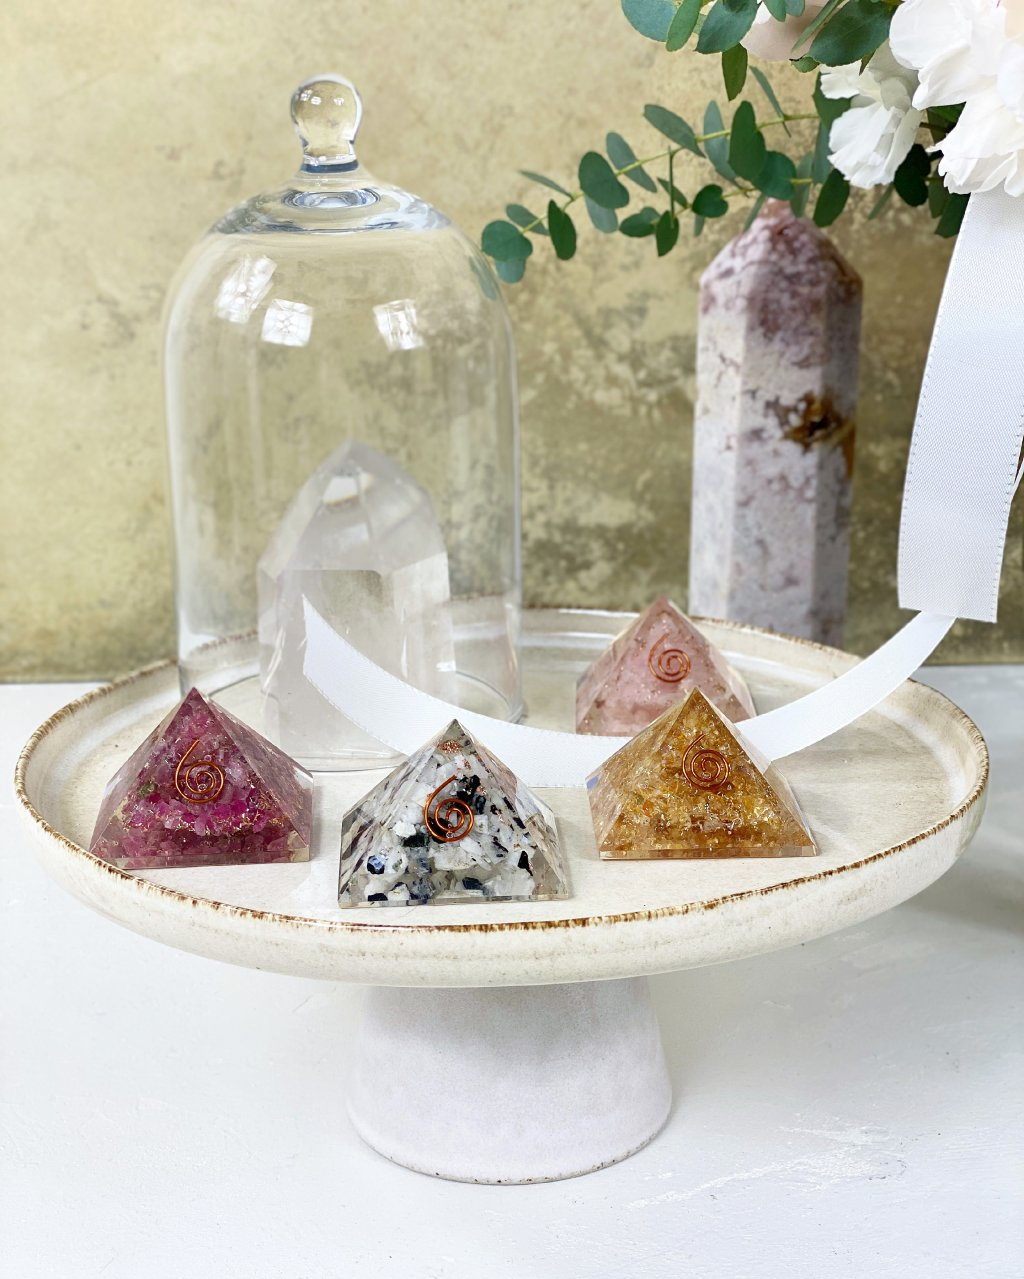 Orgonitová pyramida s rodonitem